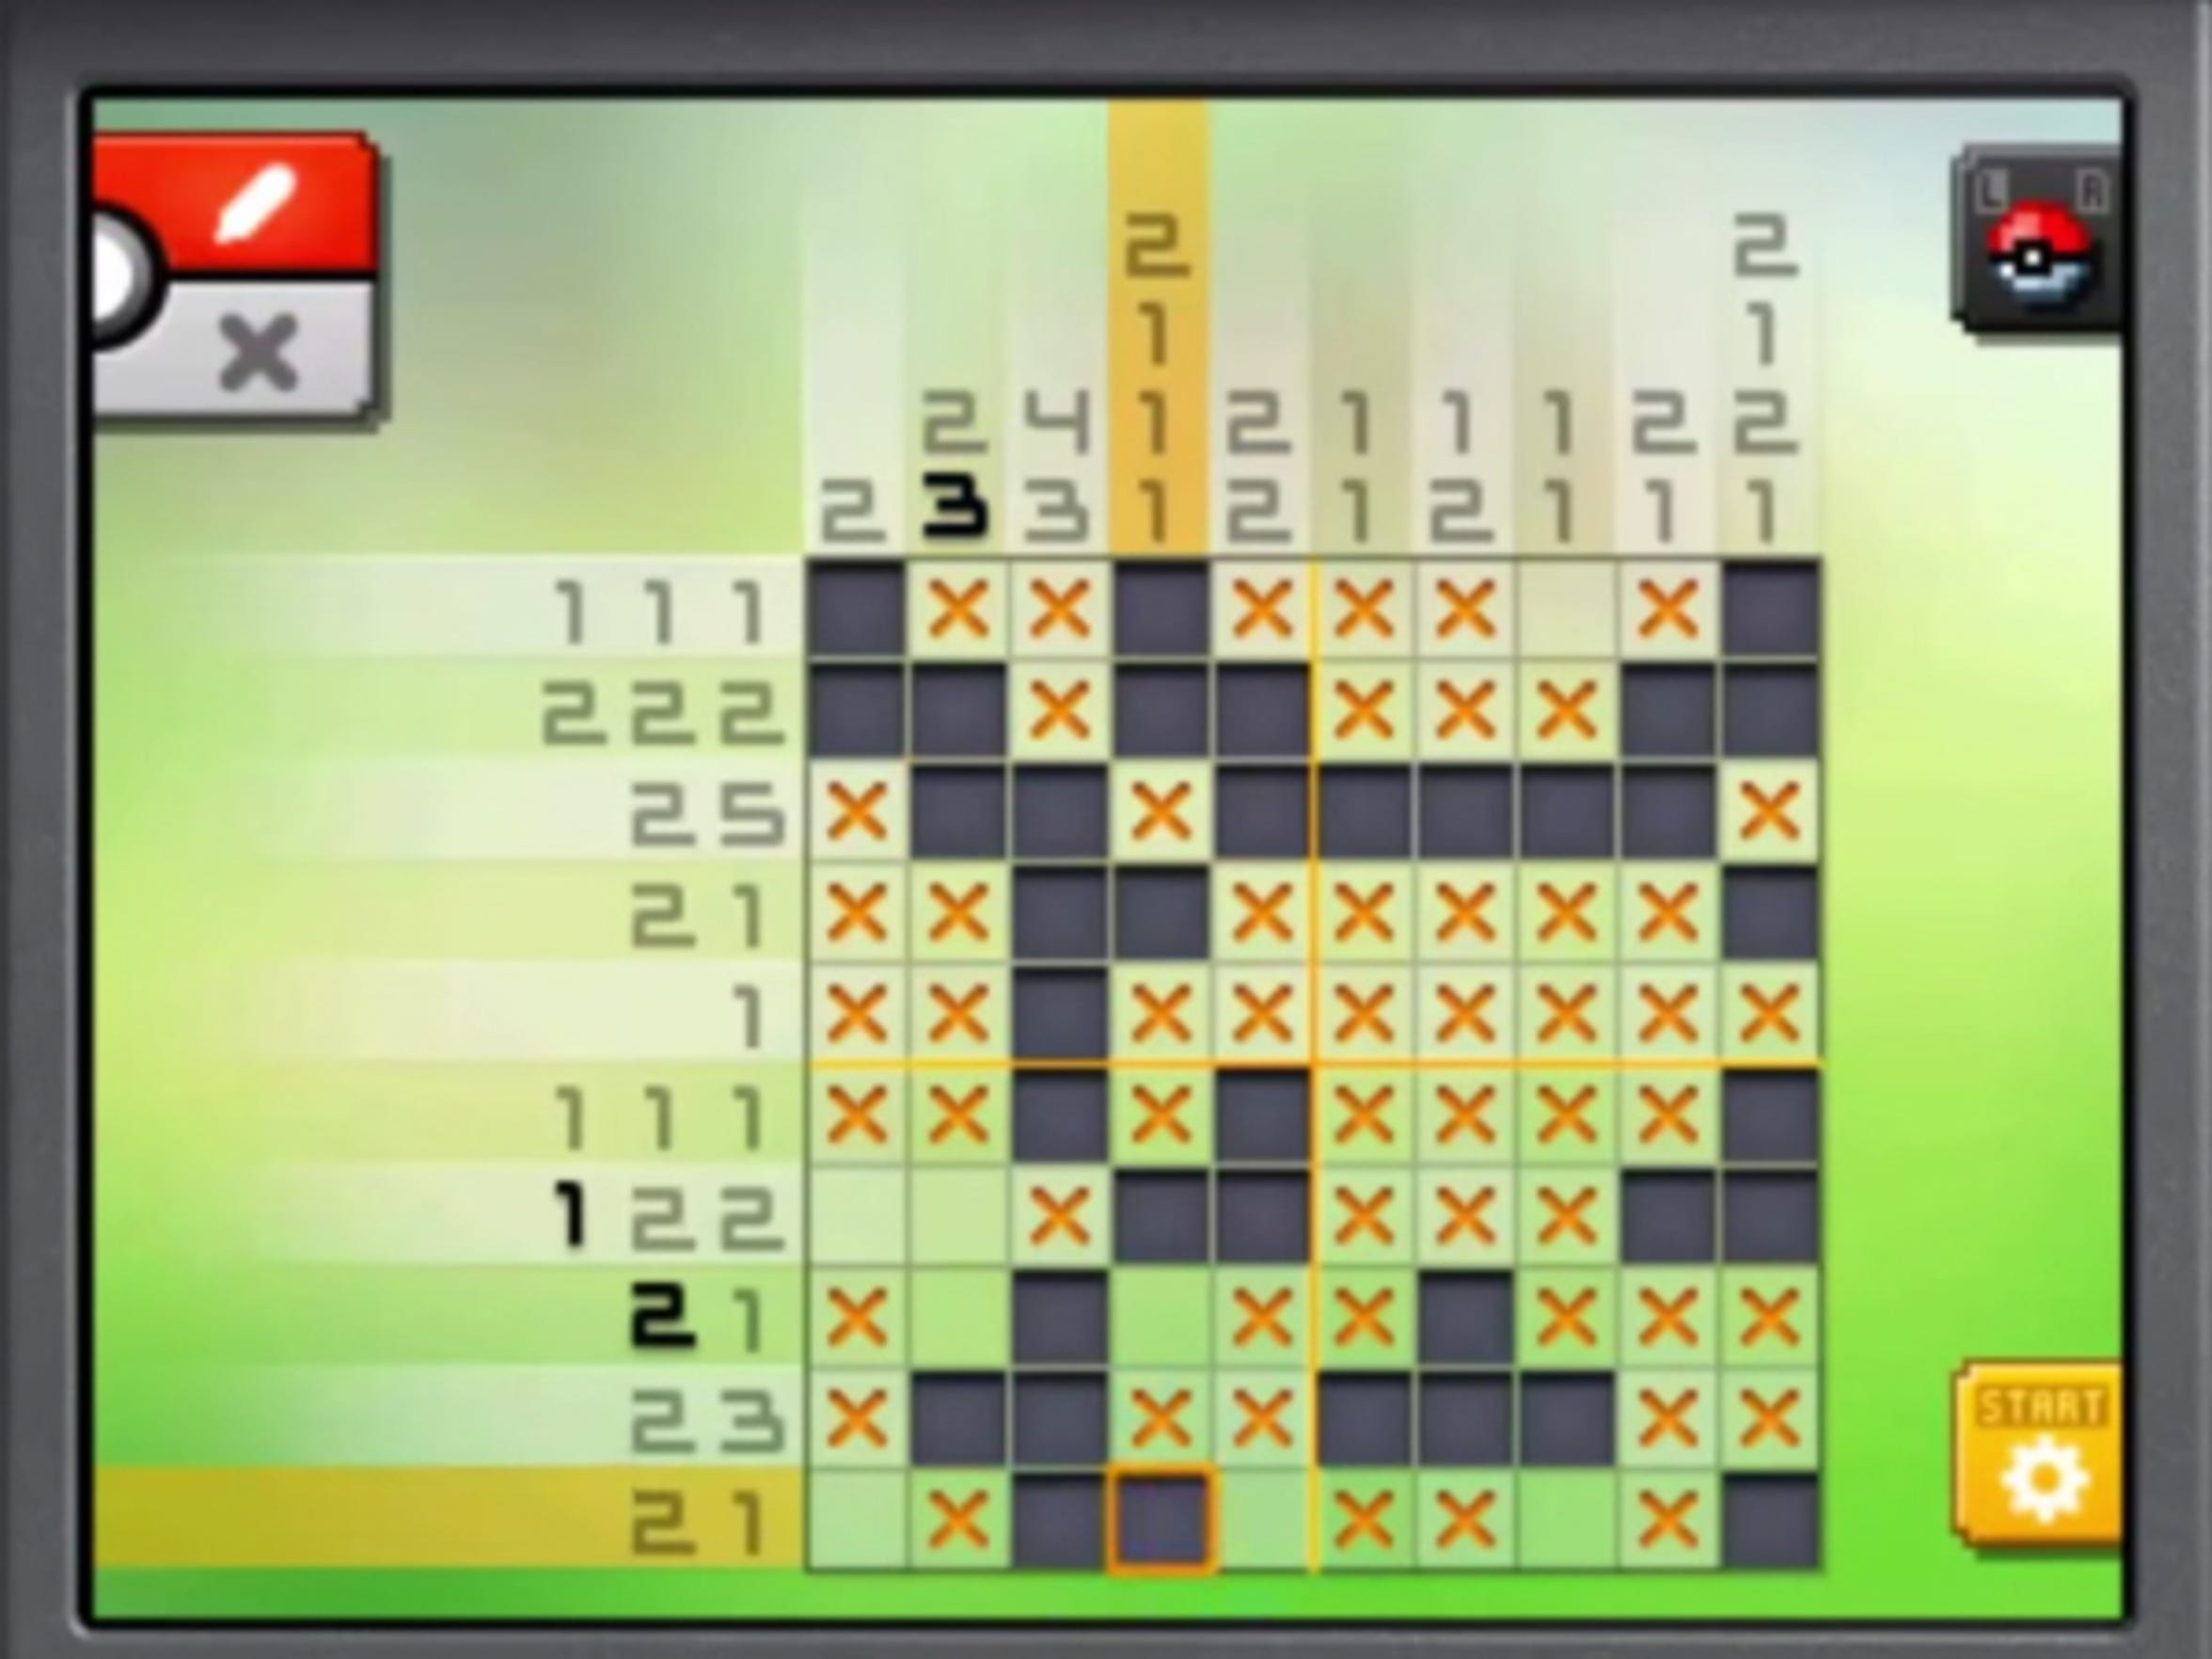 Pokemon Picross lets you solve pixel puzzles shaped